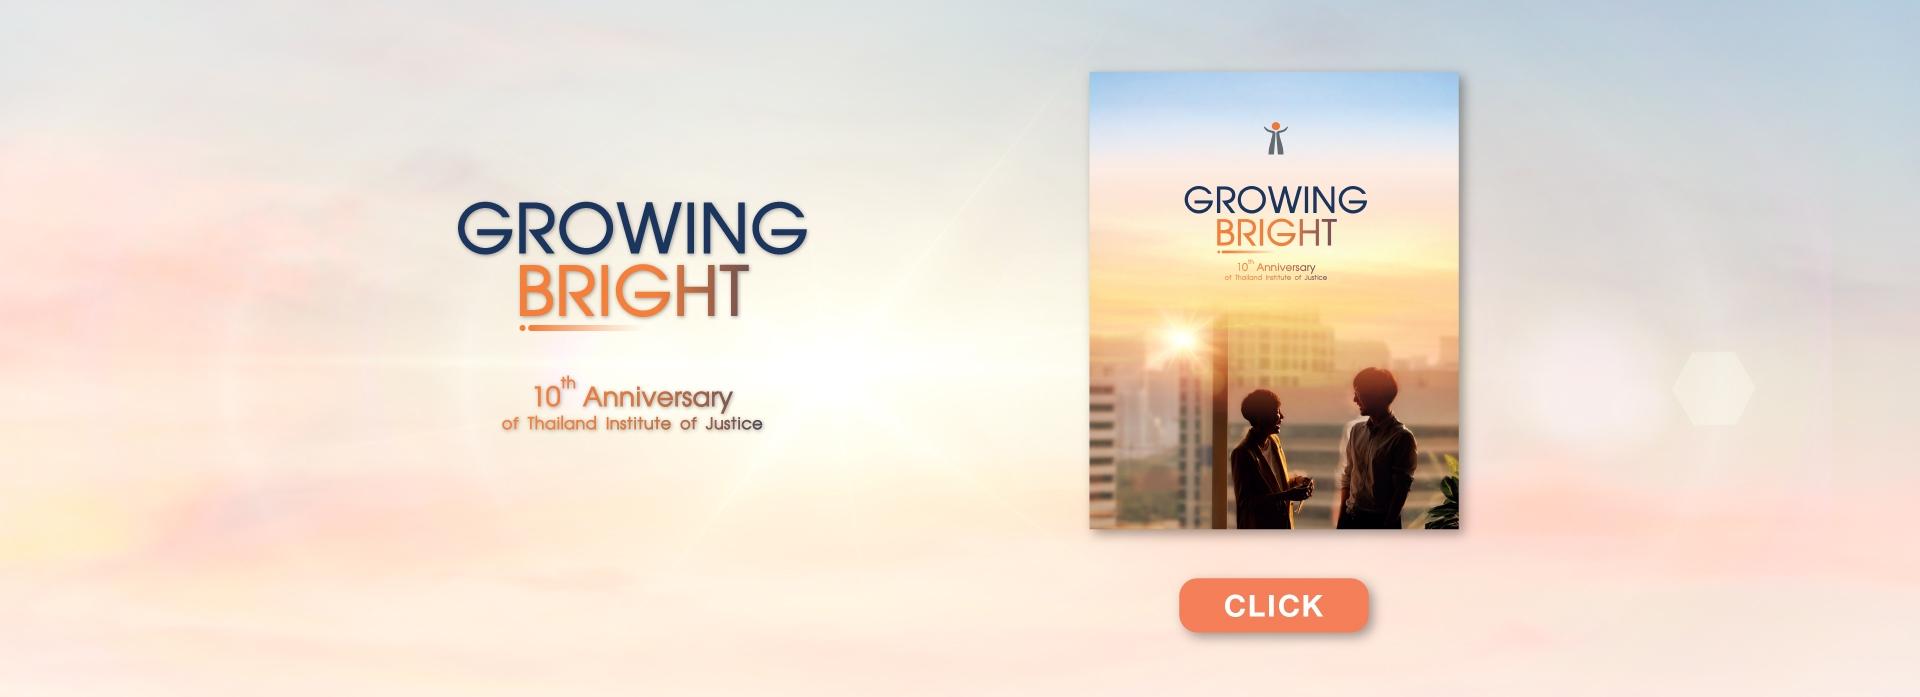 10th TIJ Growing Bright